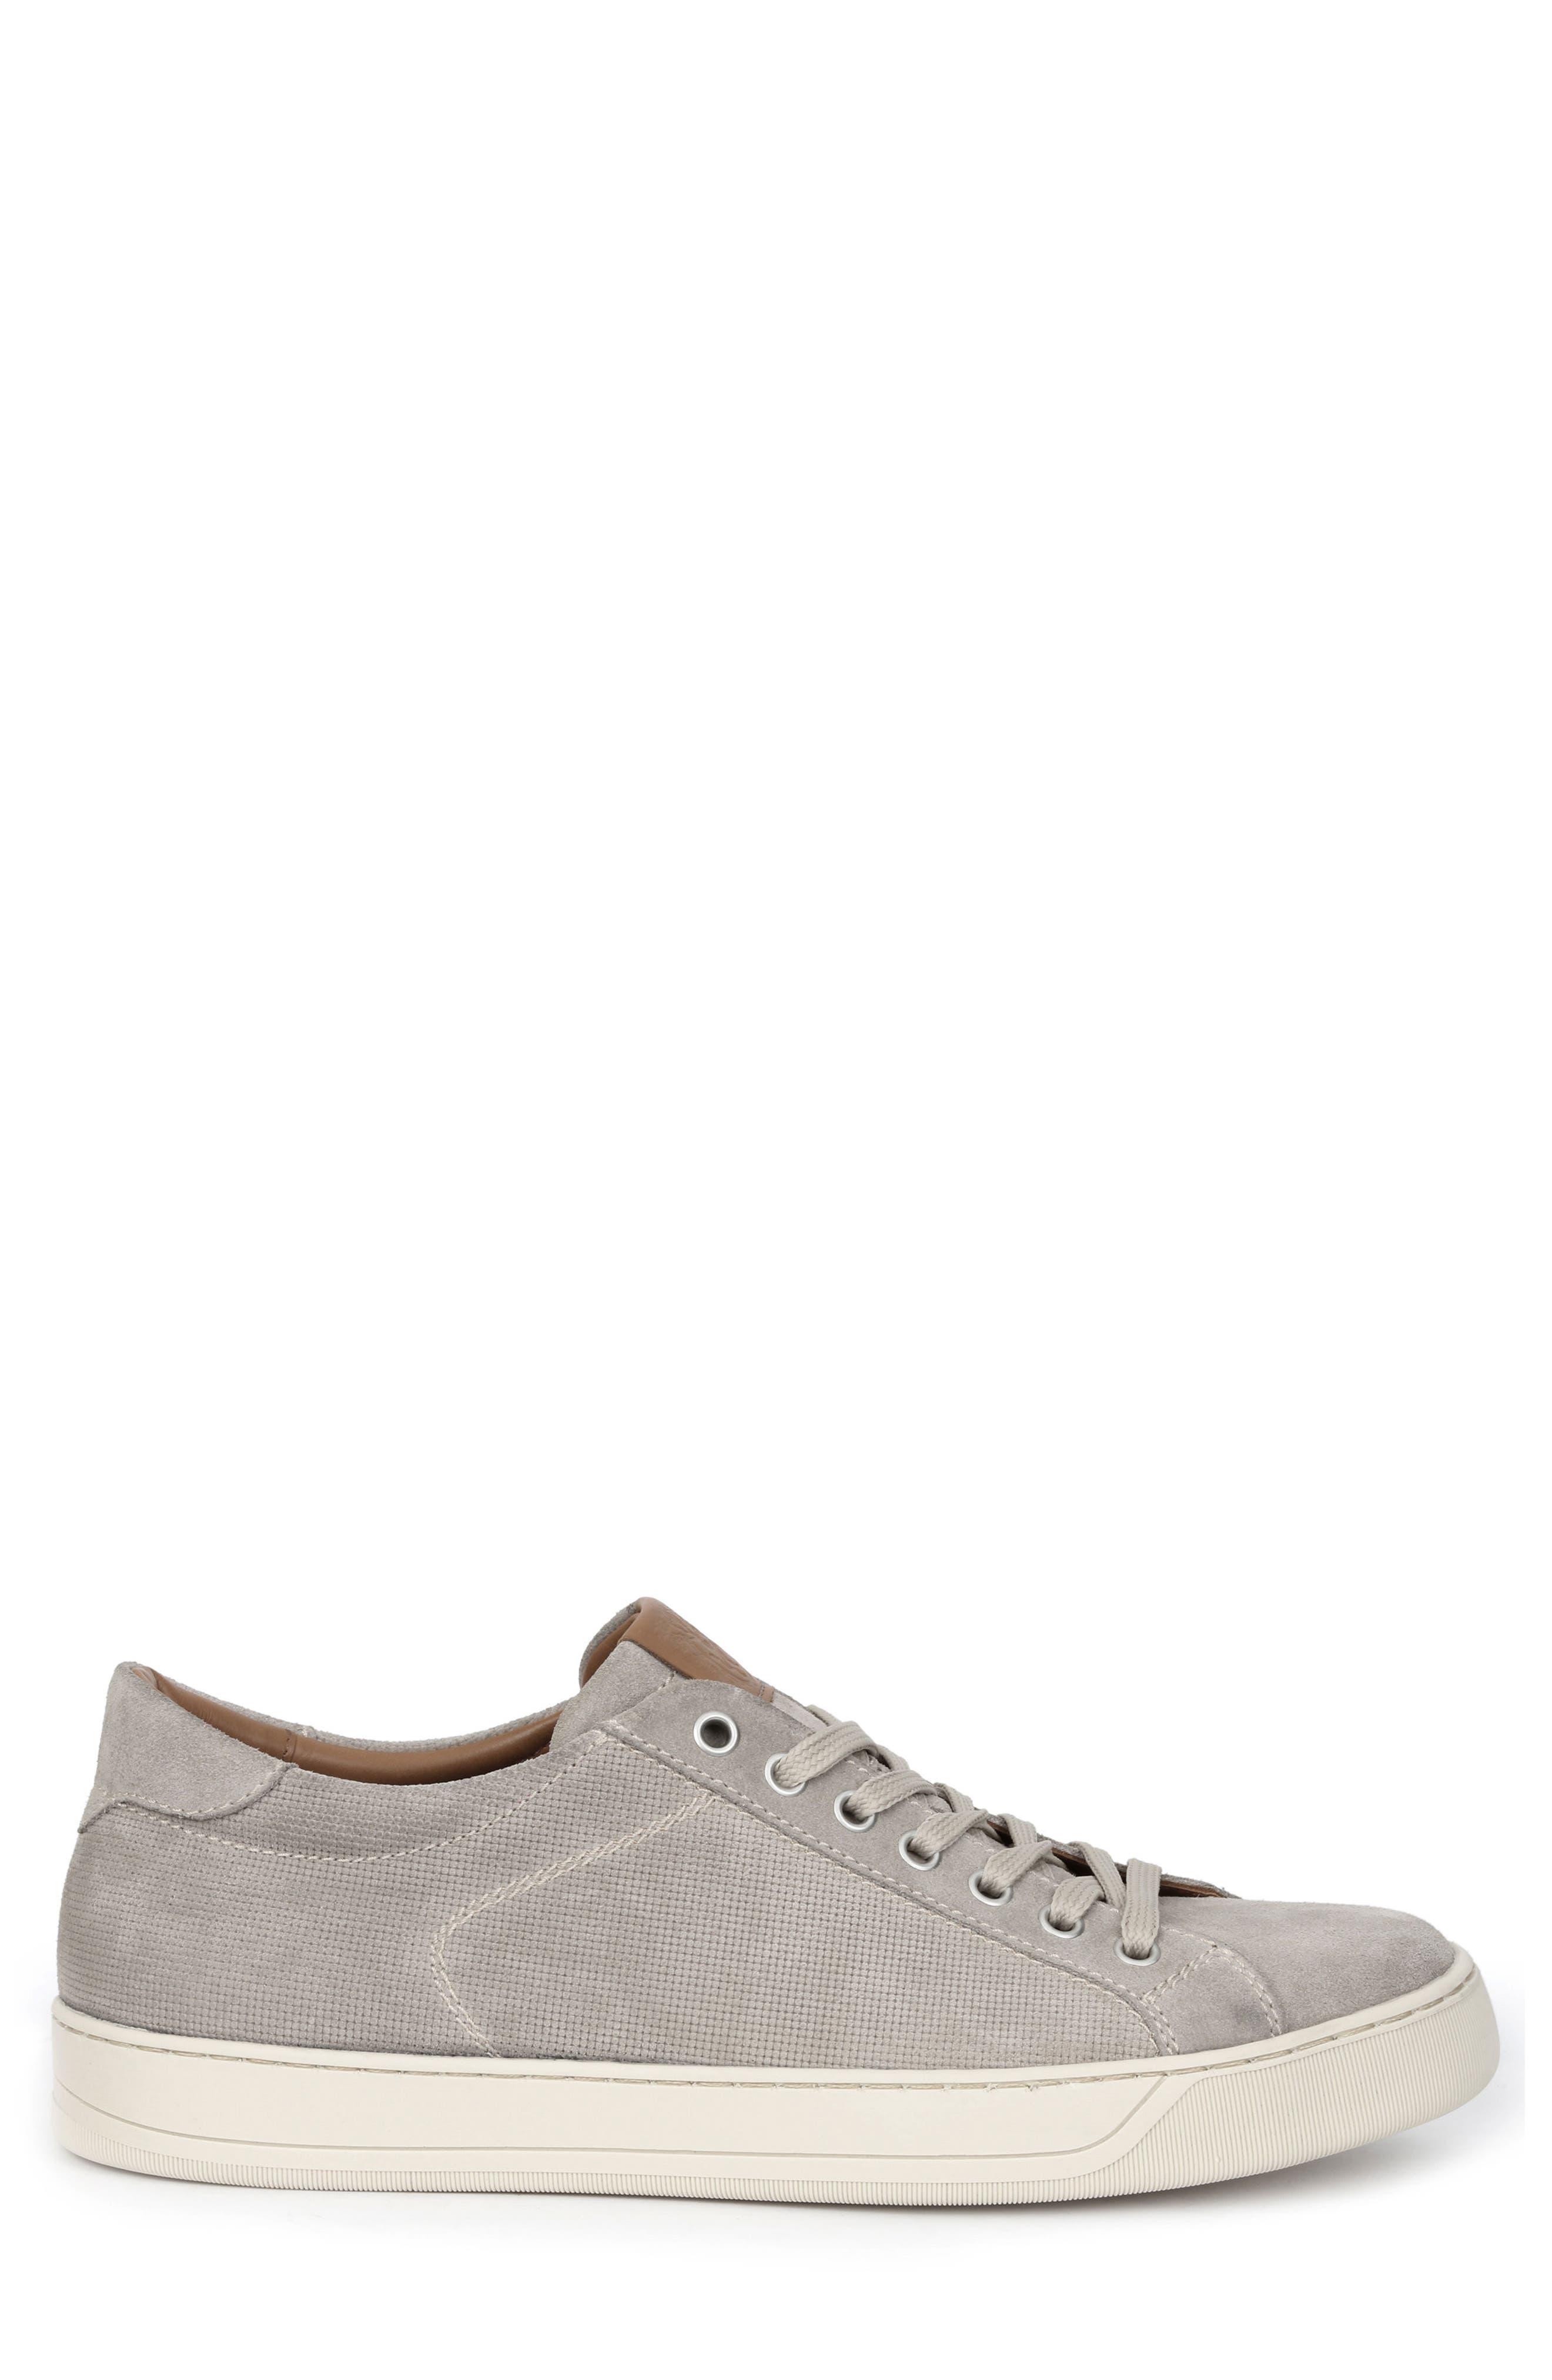 Walter Sneaker,                             Alternate thumbnail 3, color,                             020